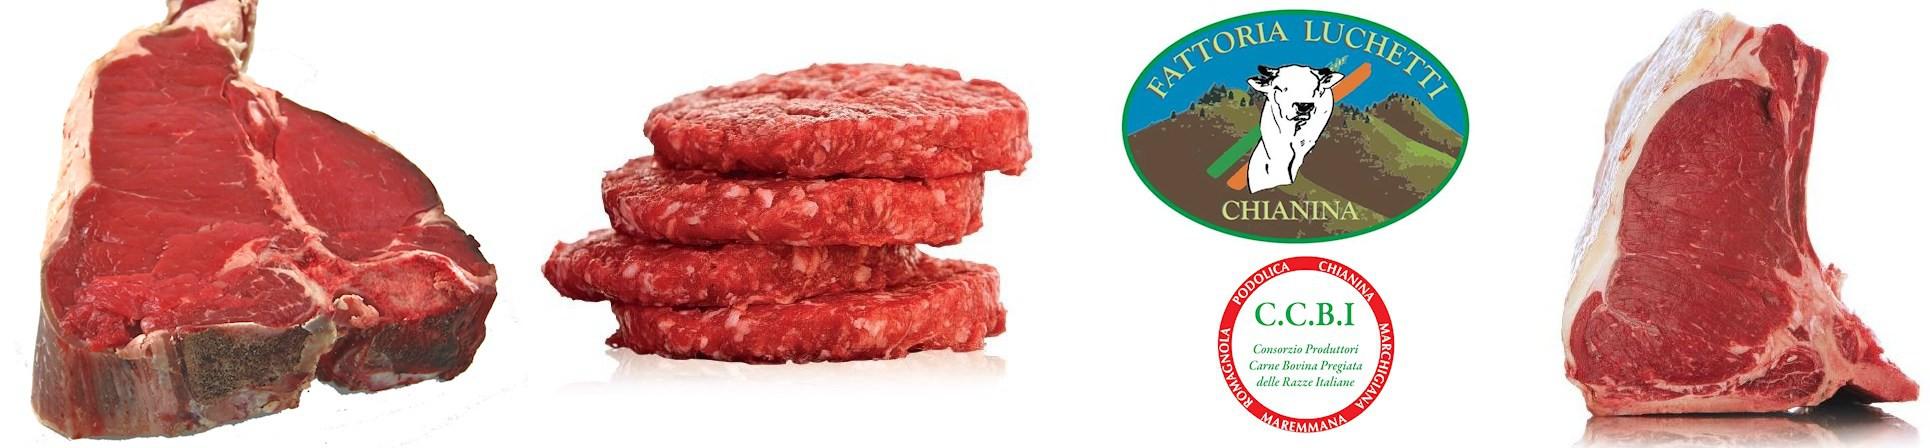 Carni pregiate Chianina - vendita online